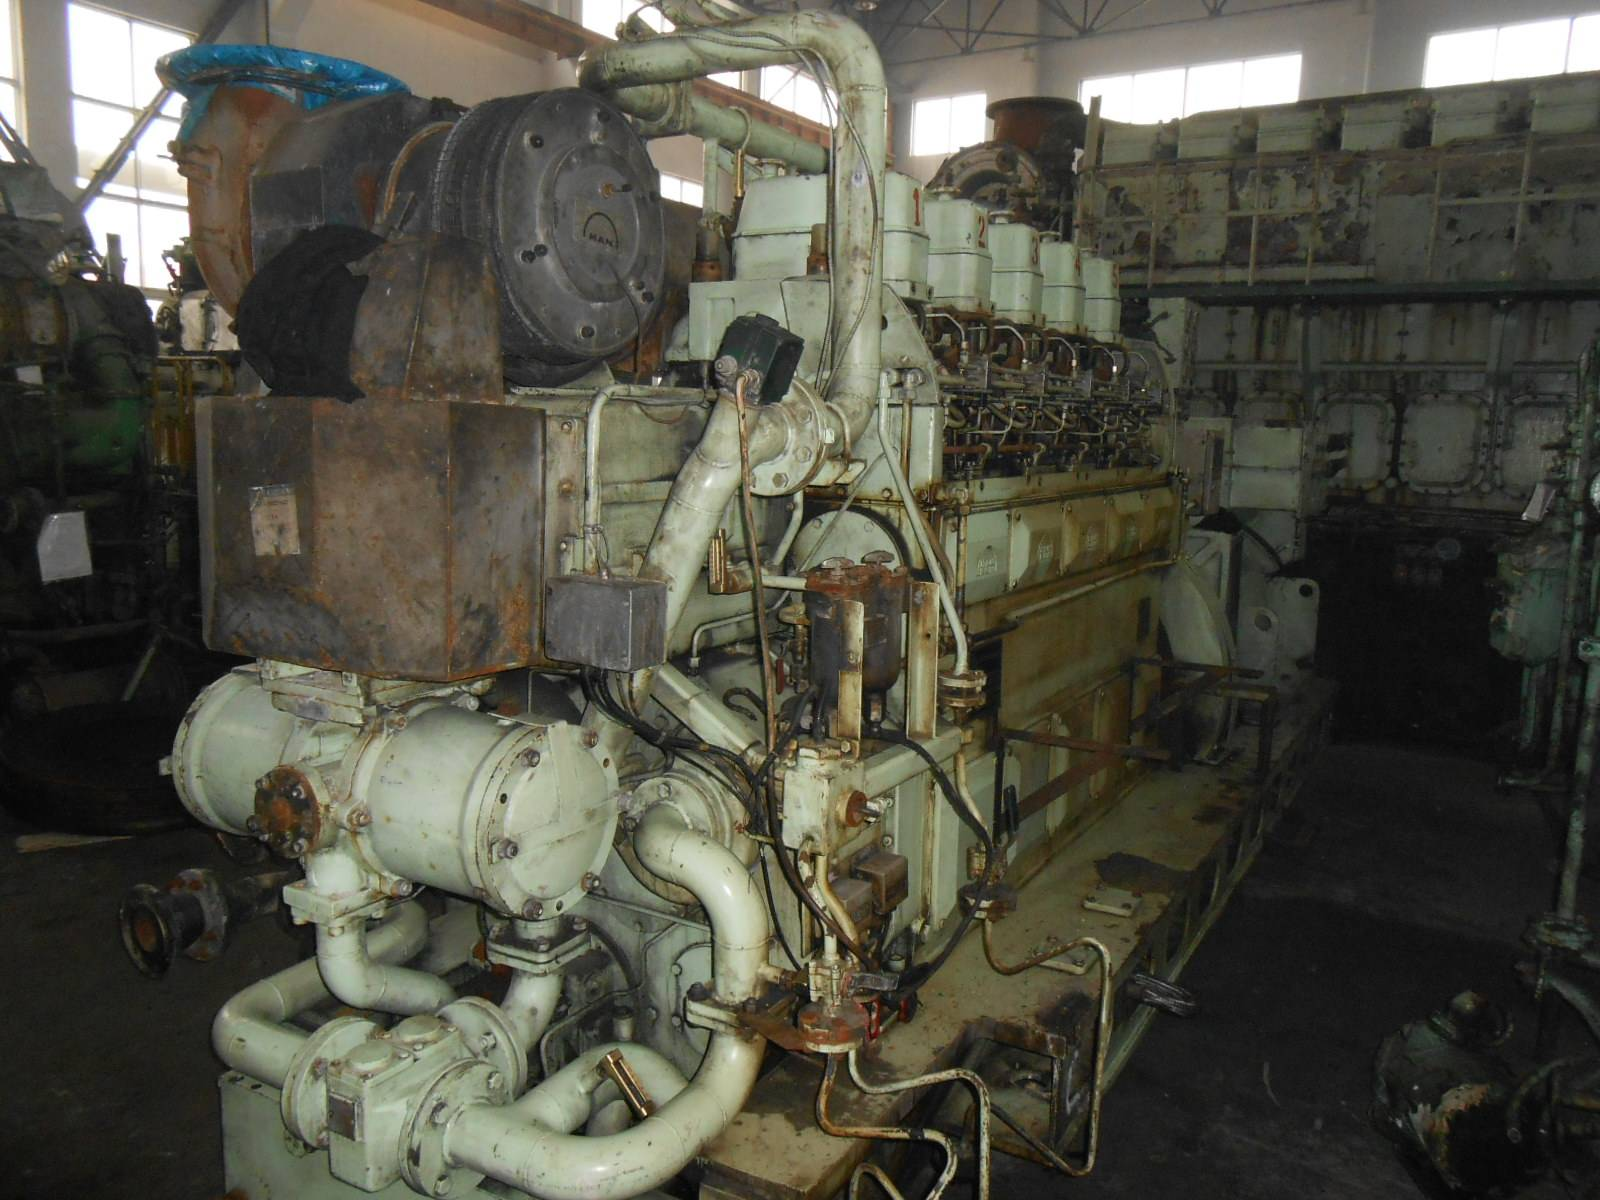 QINHUANGDAO SINOOCEAN MARINE stock MAN B&W 5L23/30H crankshaft and diesel engine complete for sale